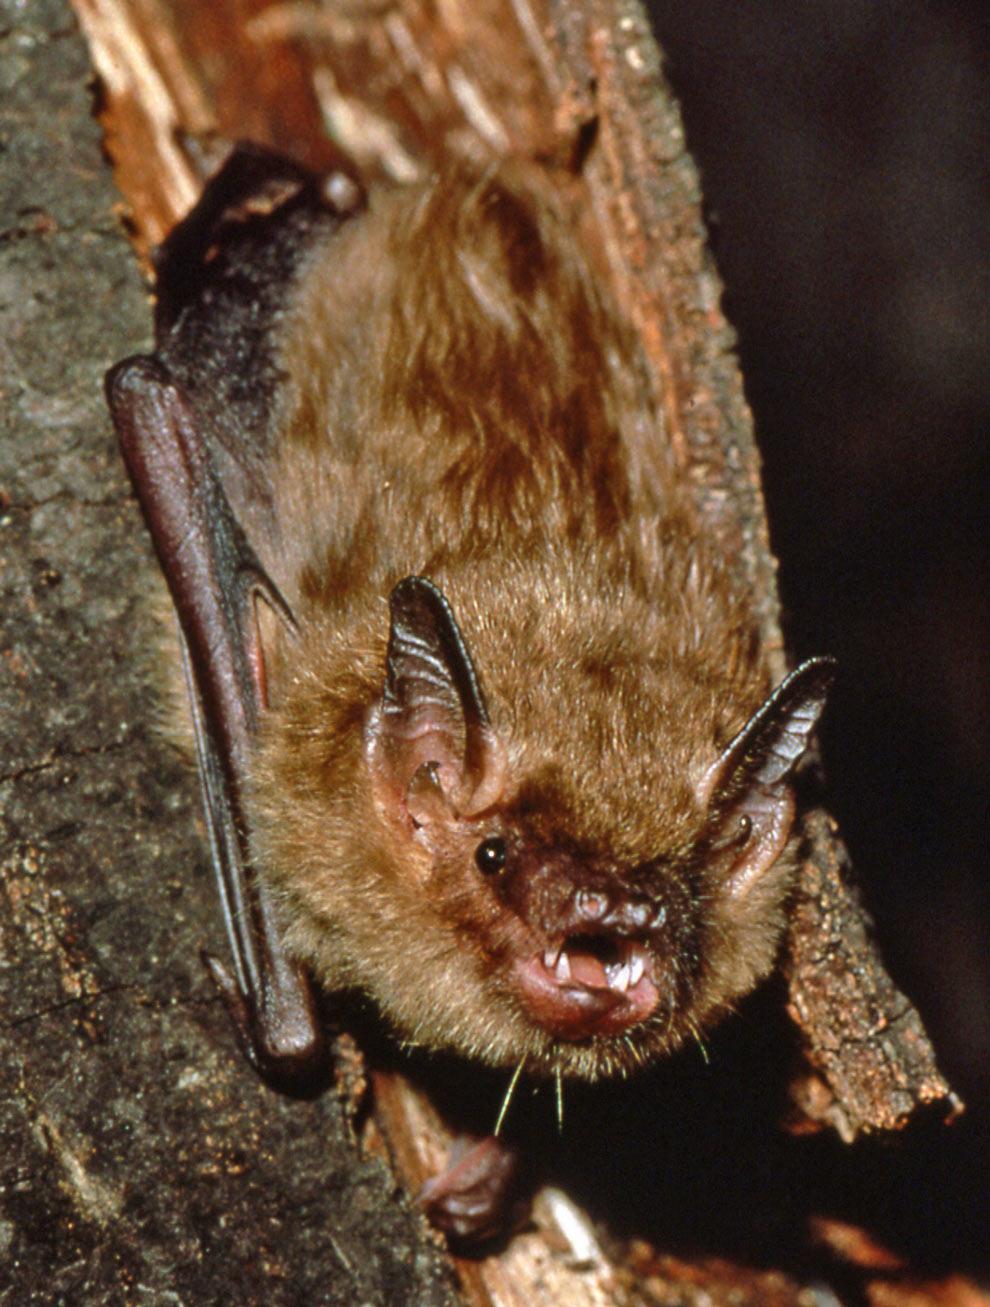 Close up photo of a big brown bat